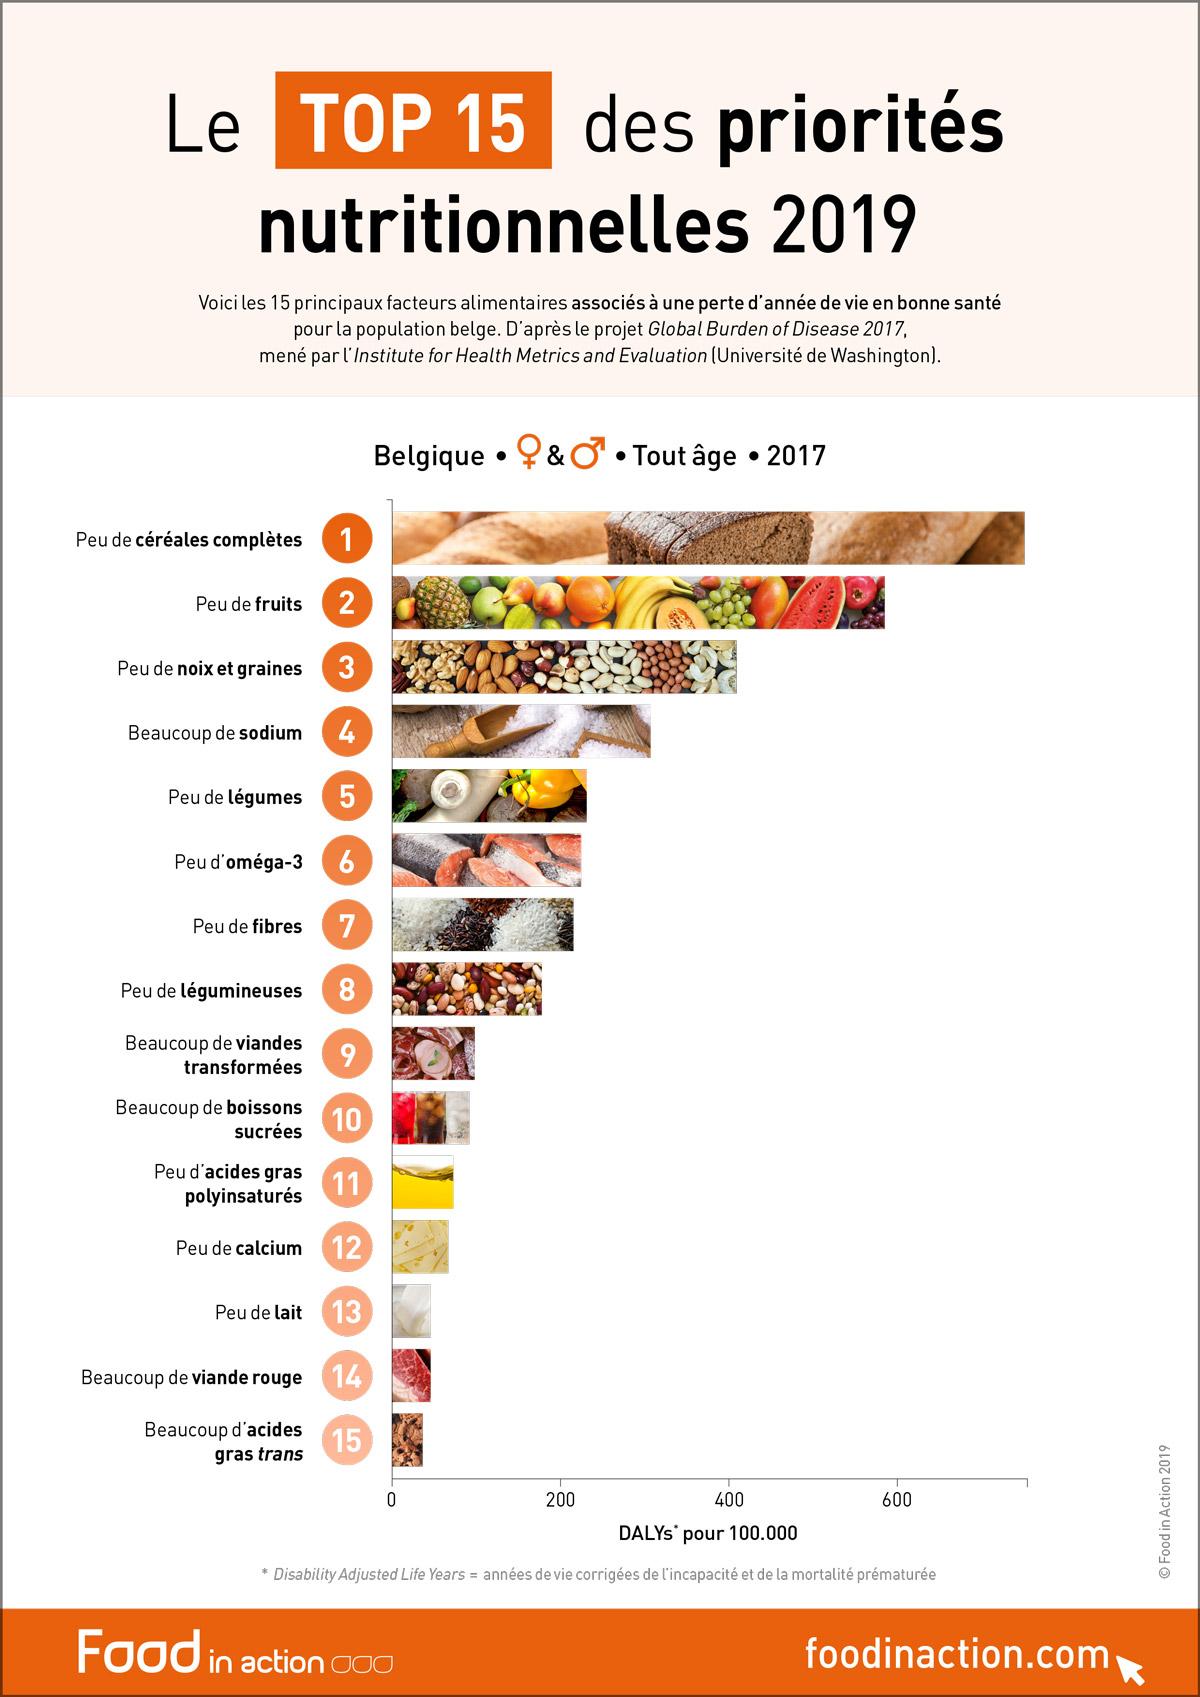 nutrigraphics-top-priorites-nutritionnelles-2019